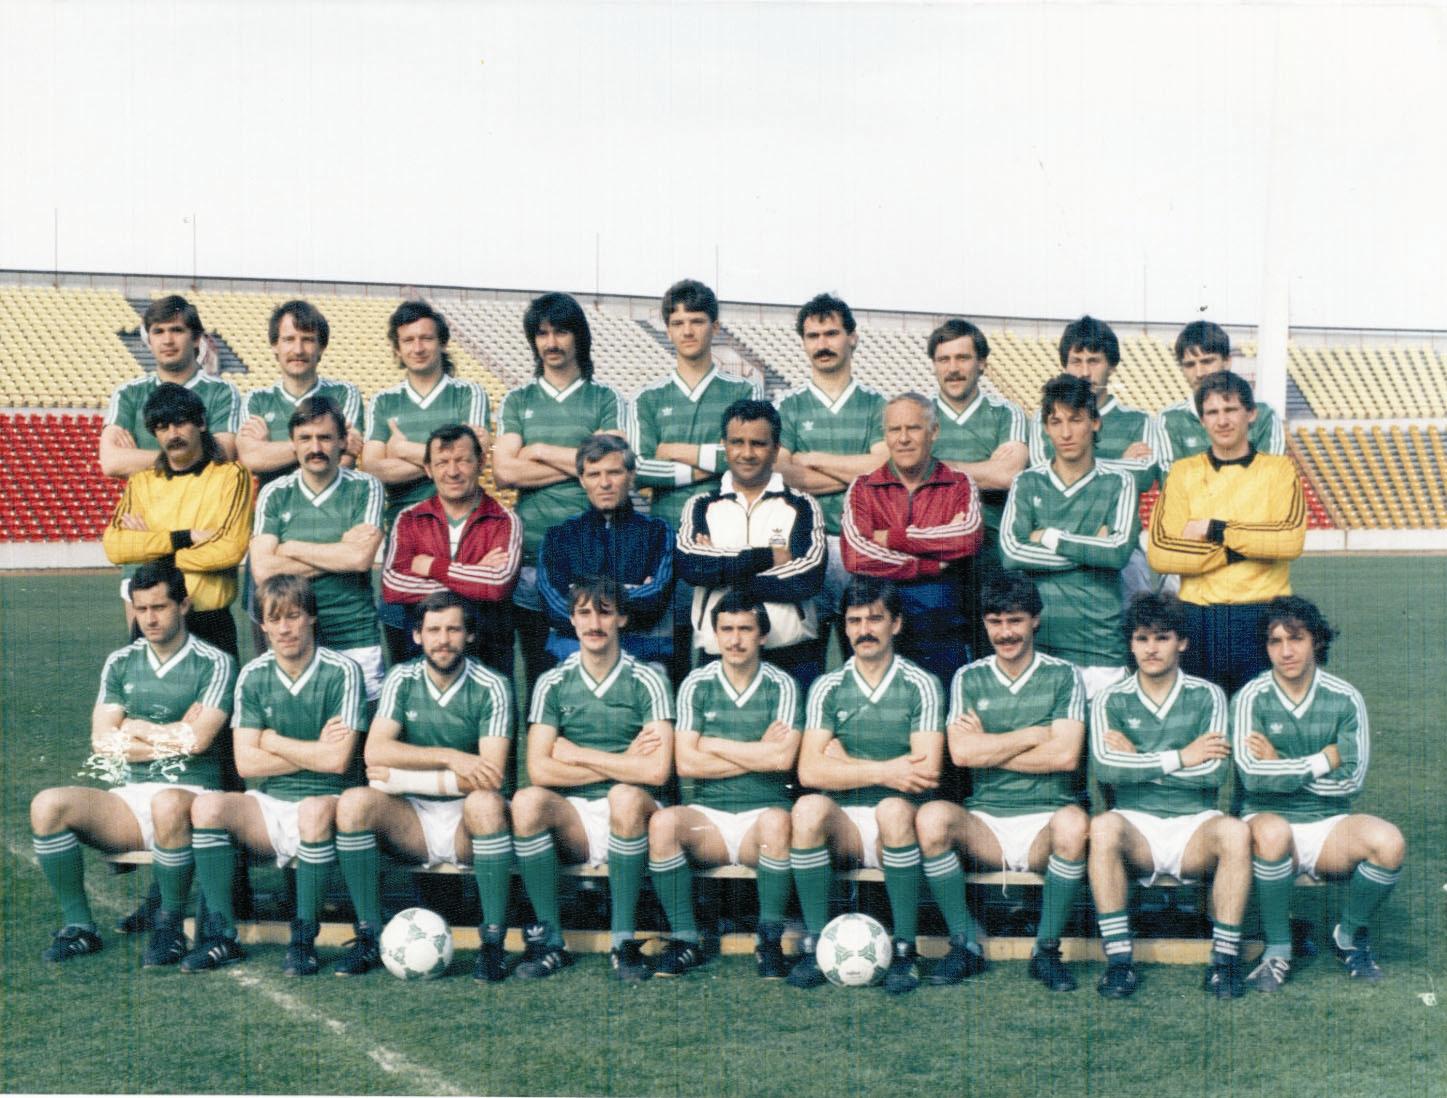 Idokapszula_1983-84_Teliszunet_bevetes_elott_Rugovics_Vendel.JPG